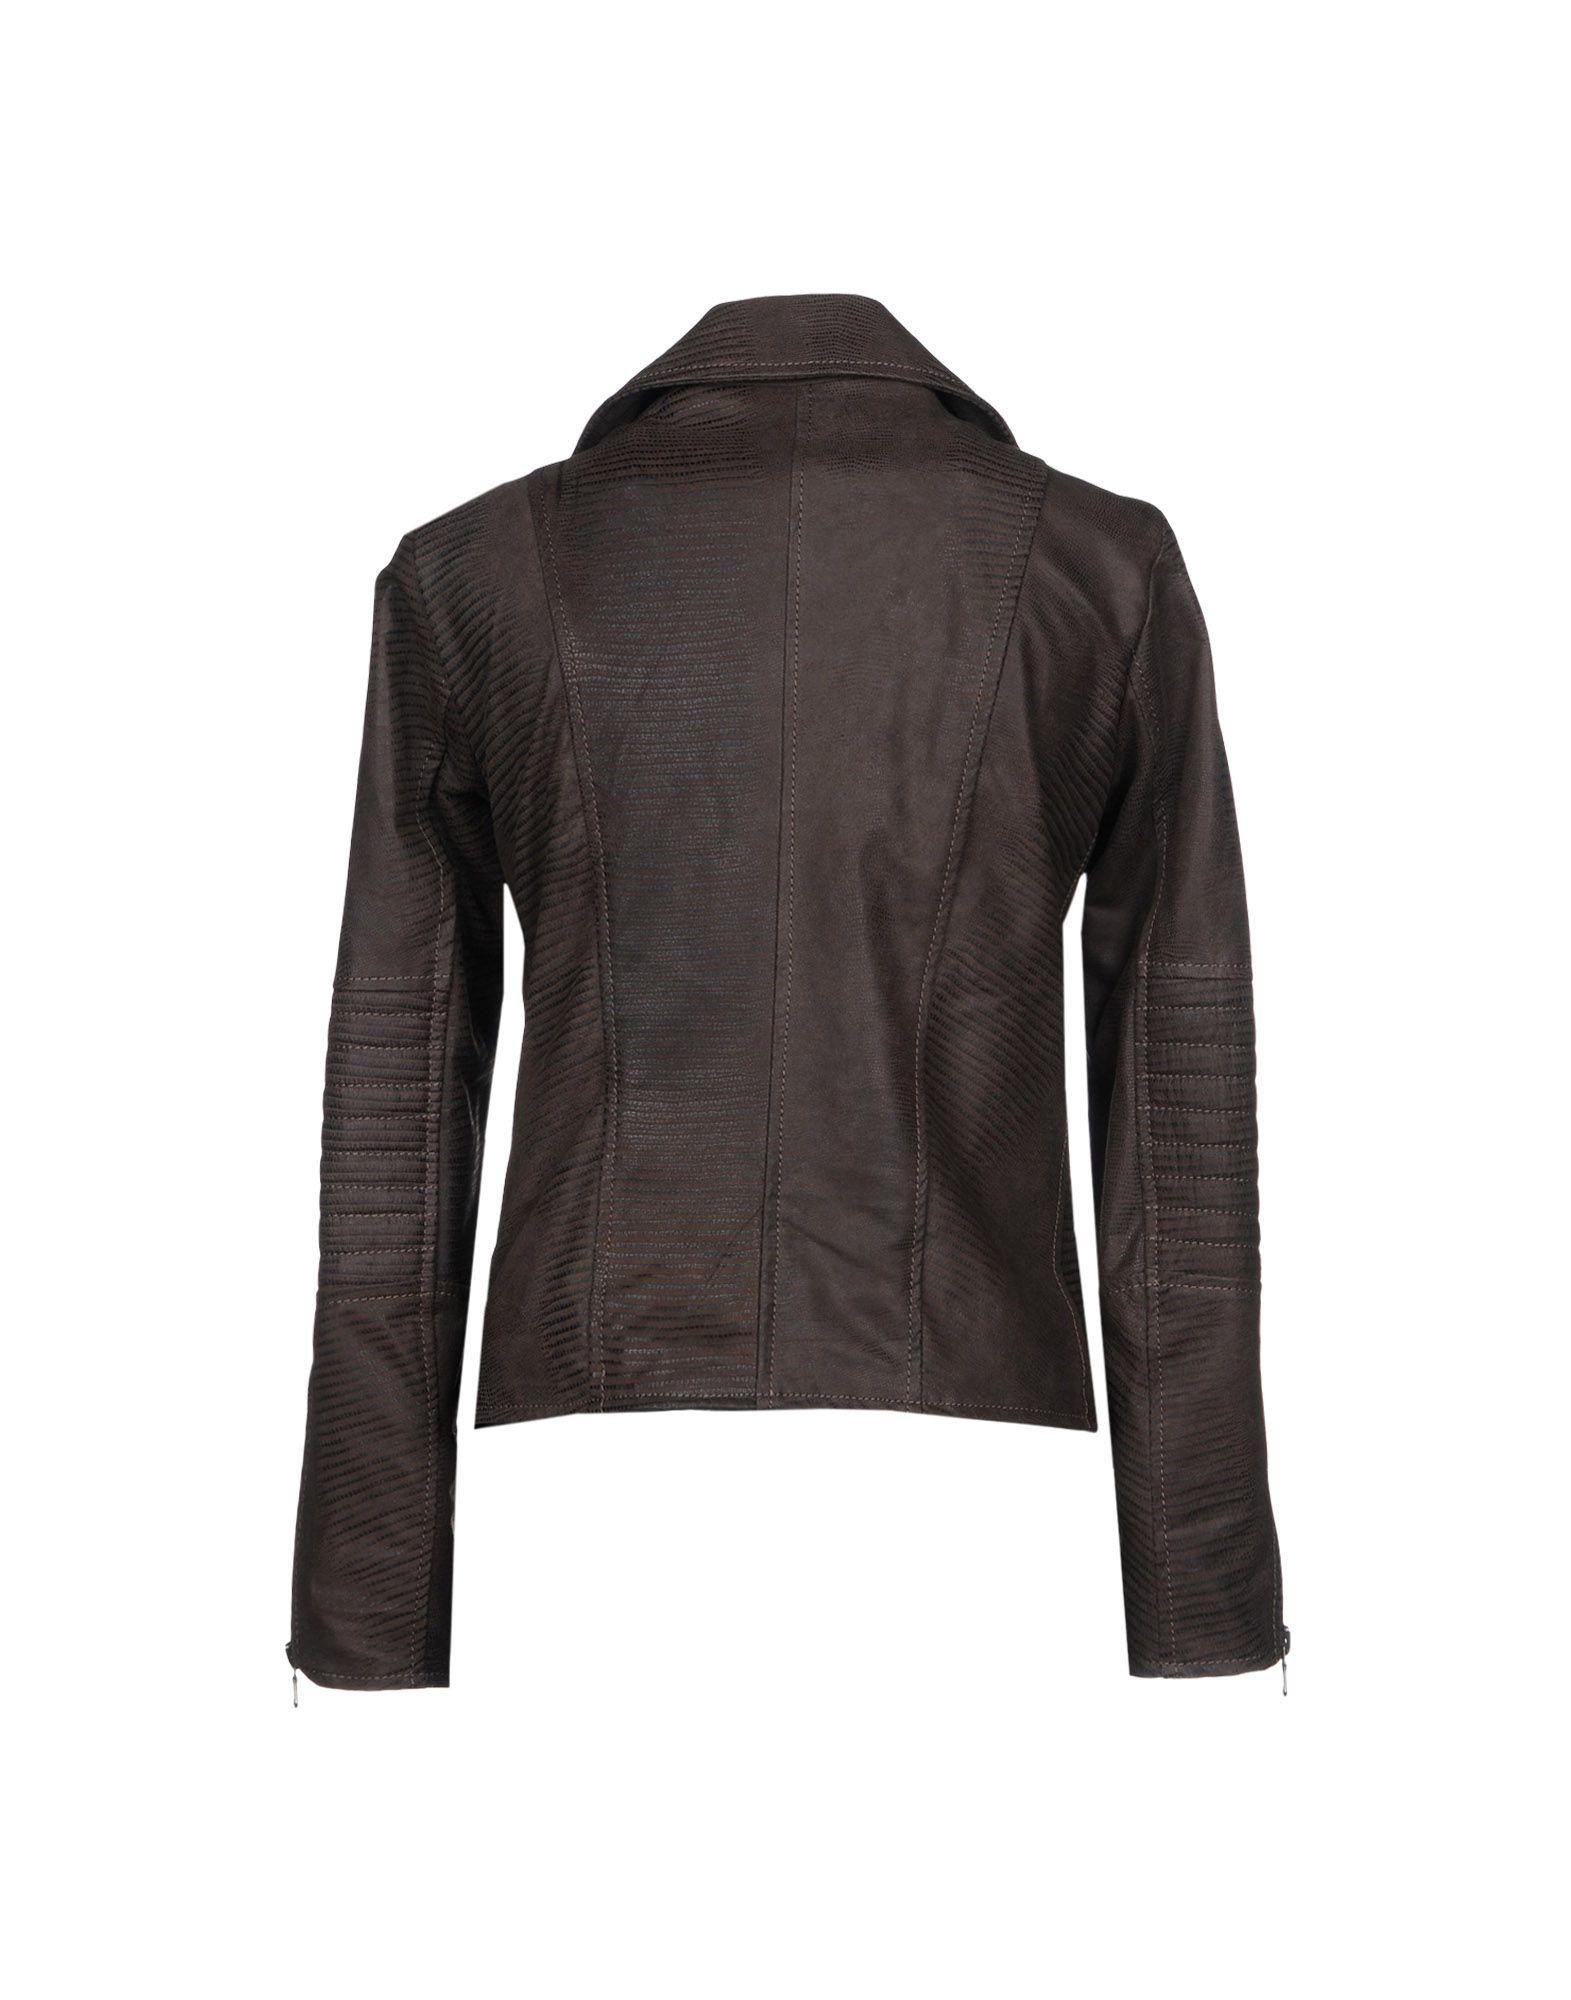 Coat & Jackets Street Leathers Dark Brown Women's Leather